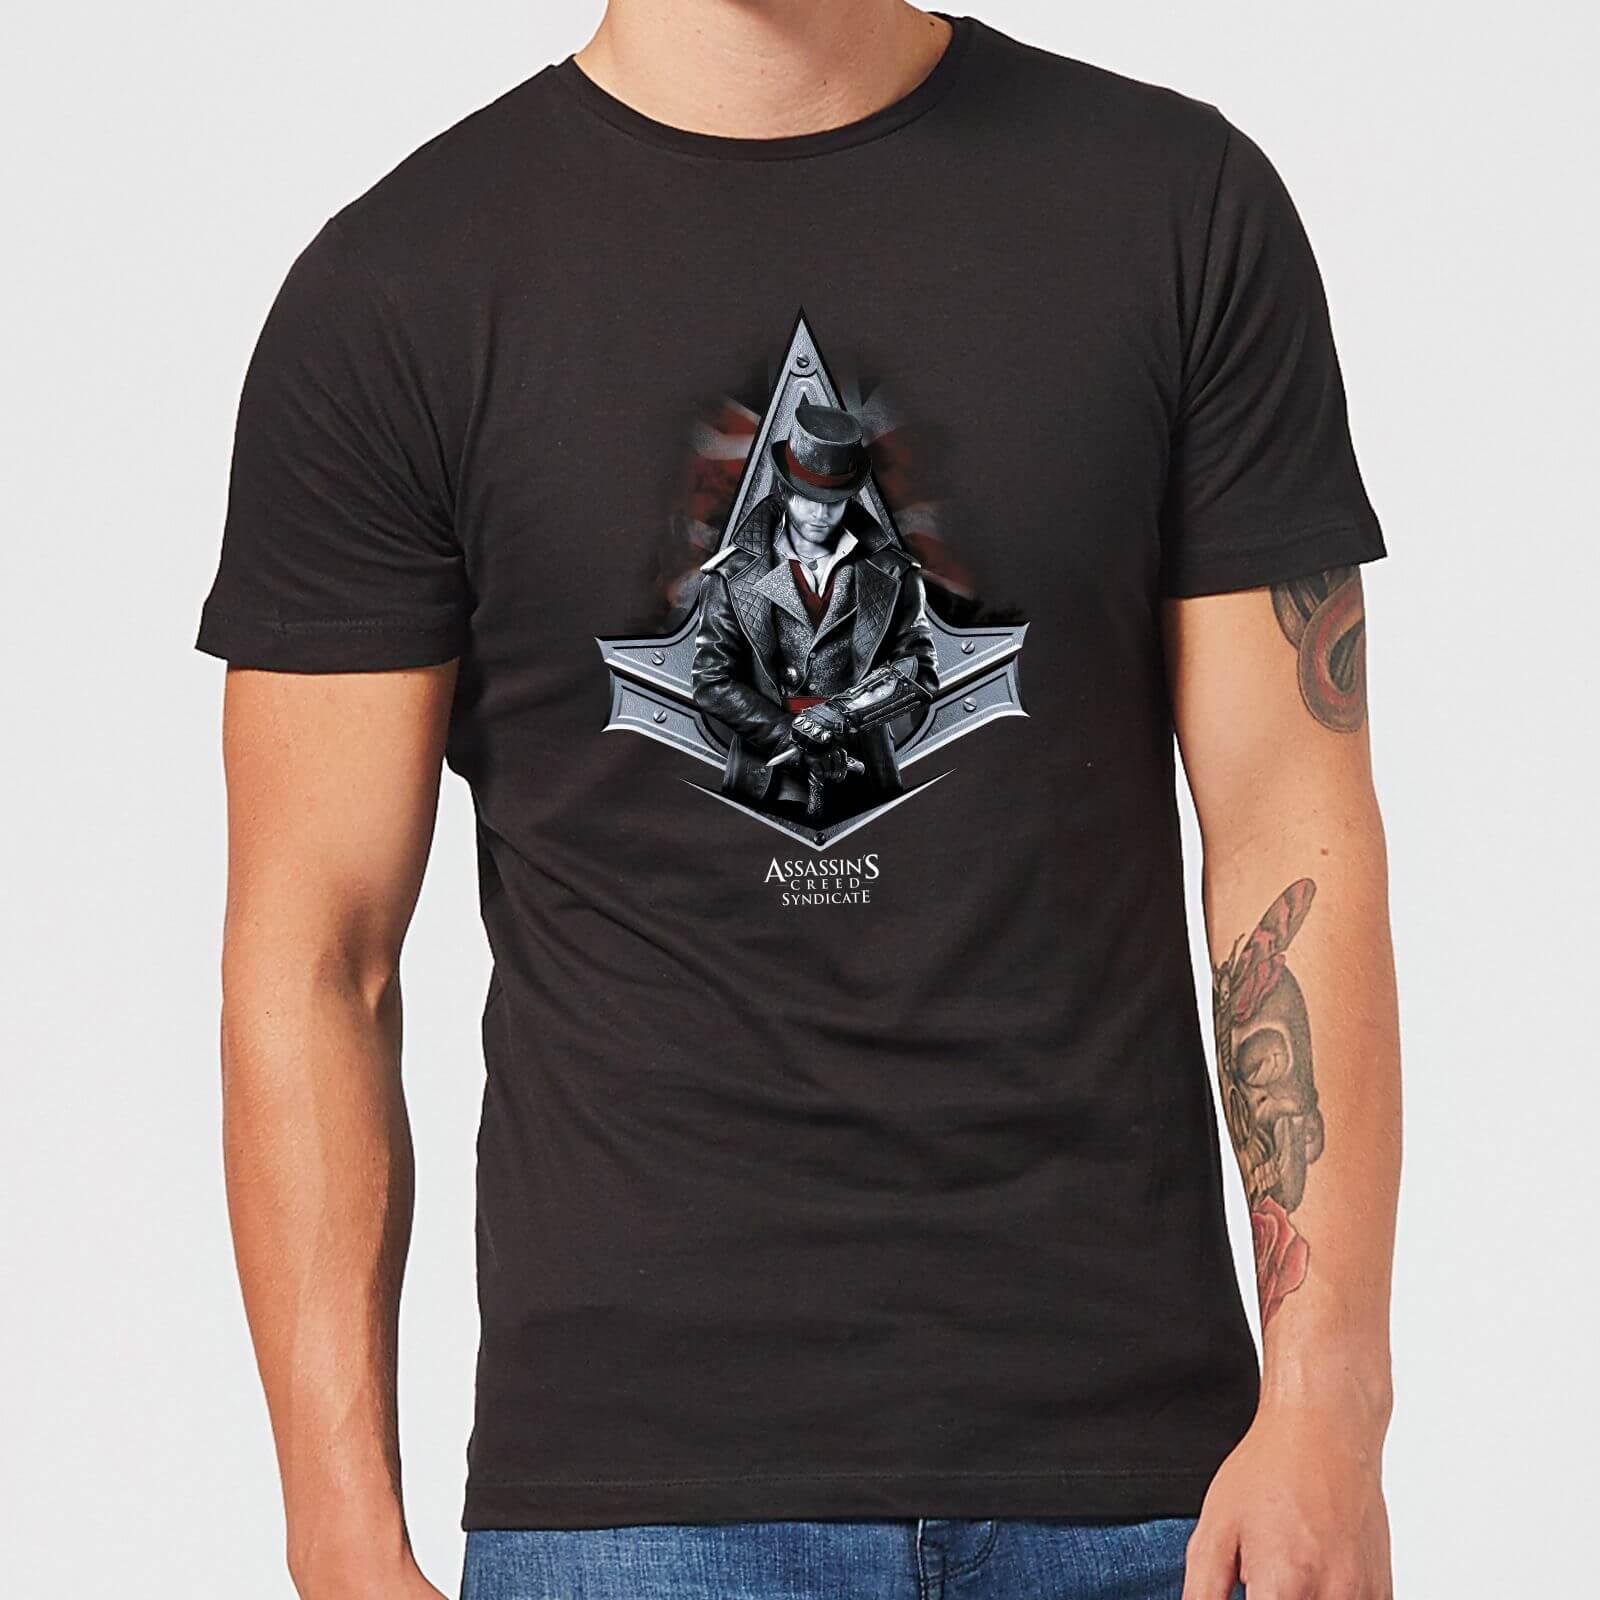 Assassin's Creed T-Shirt Homme Jacob Assassin's Creed Syndicate - Noir - XXL - Noir